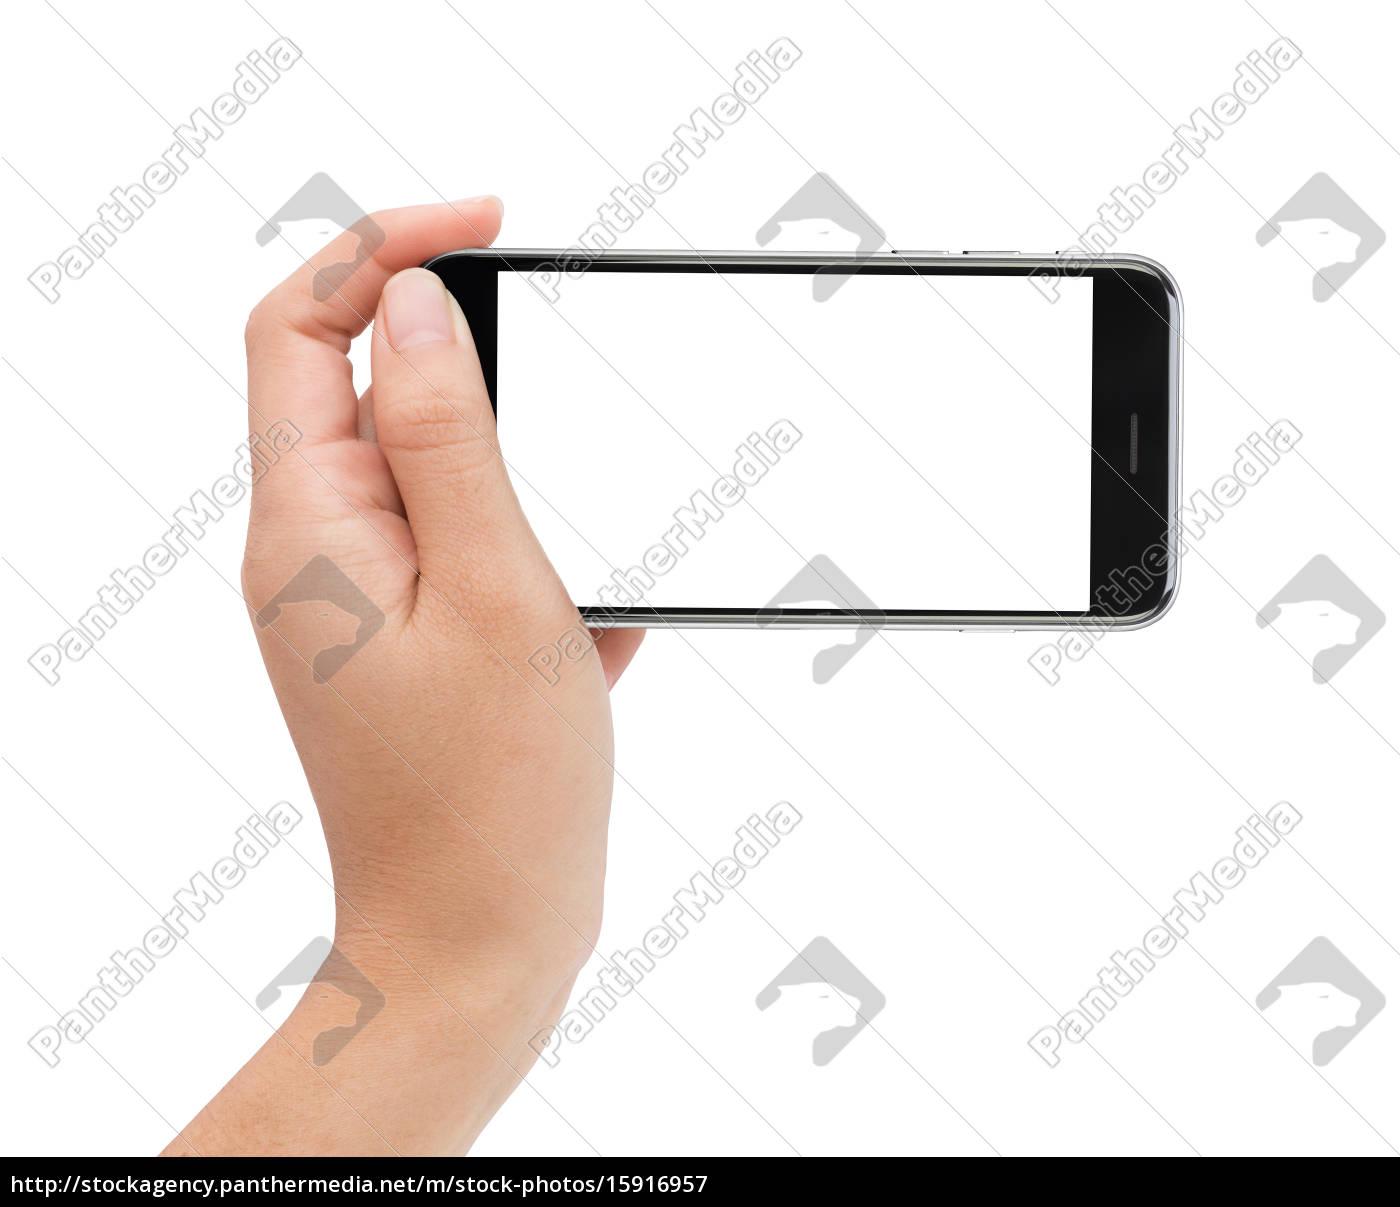 female, hand, holding, phone, white, screen - 15916957